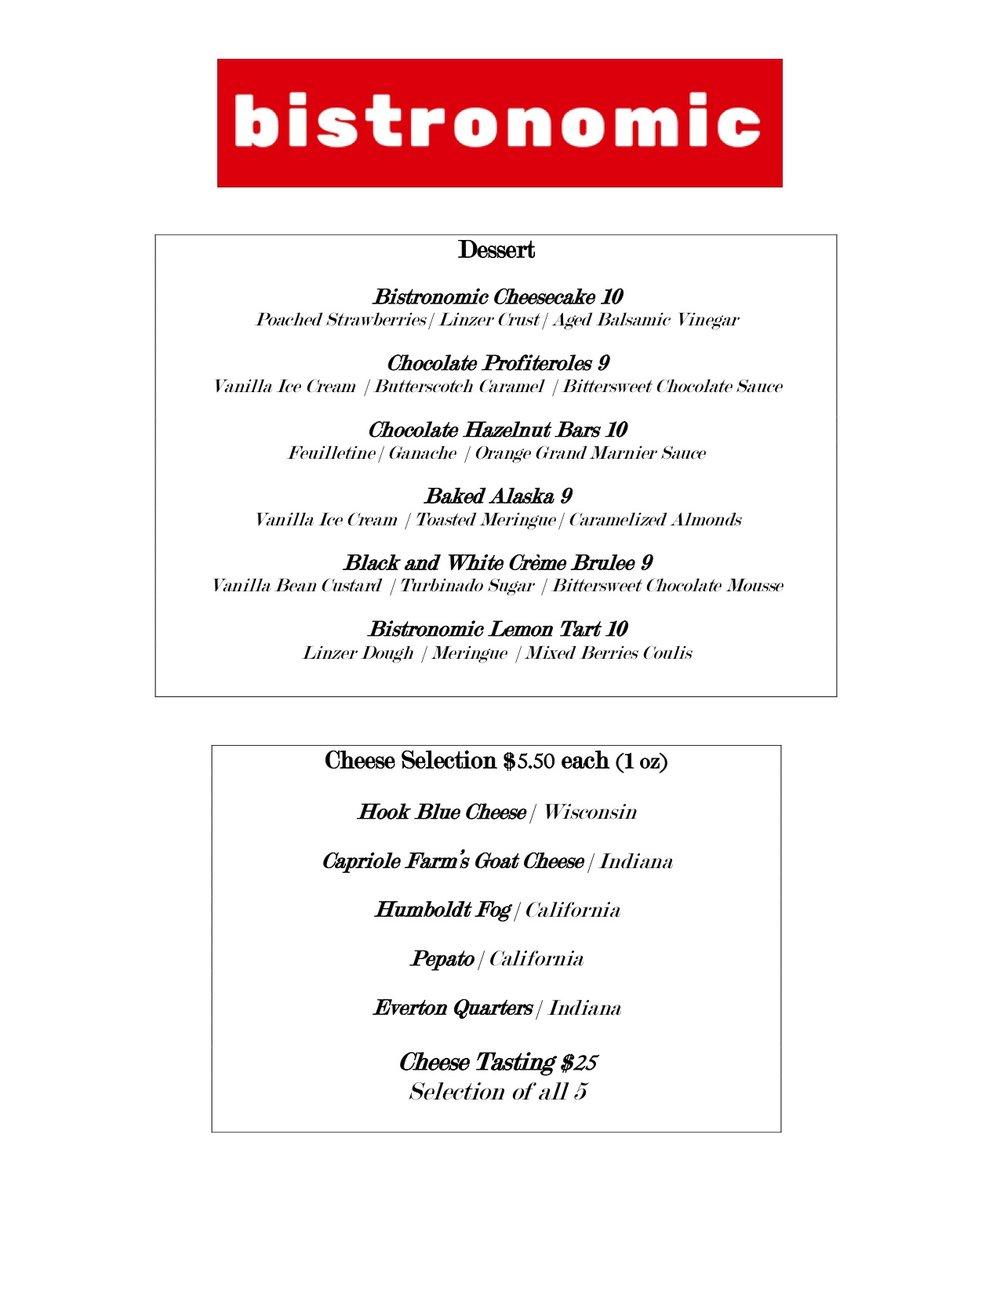 Dessert Menu 4.14.18.jpg